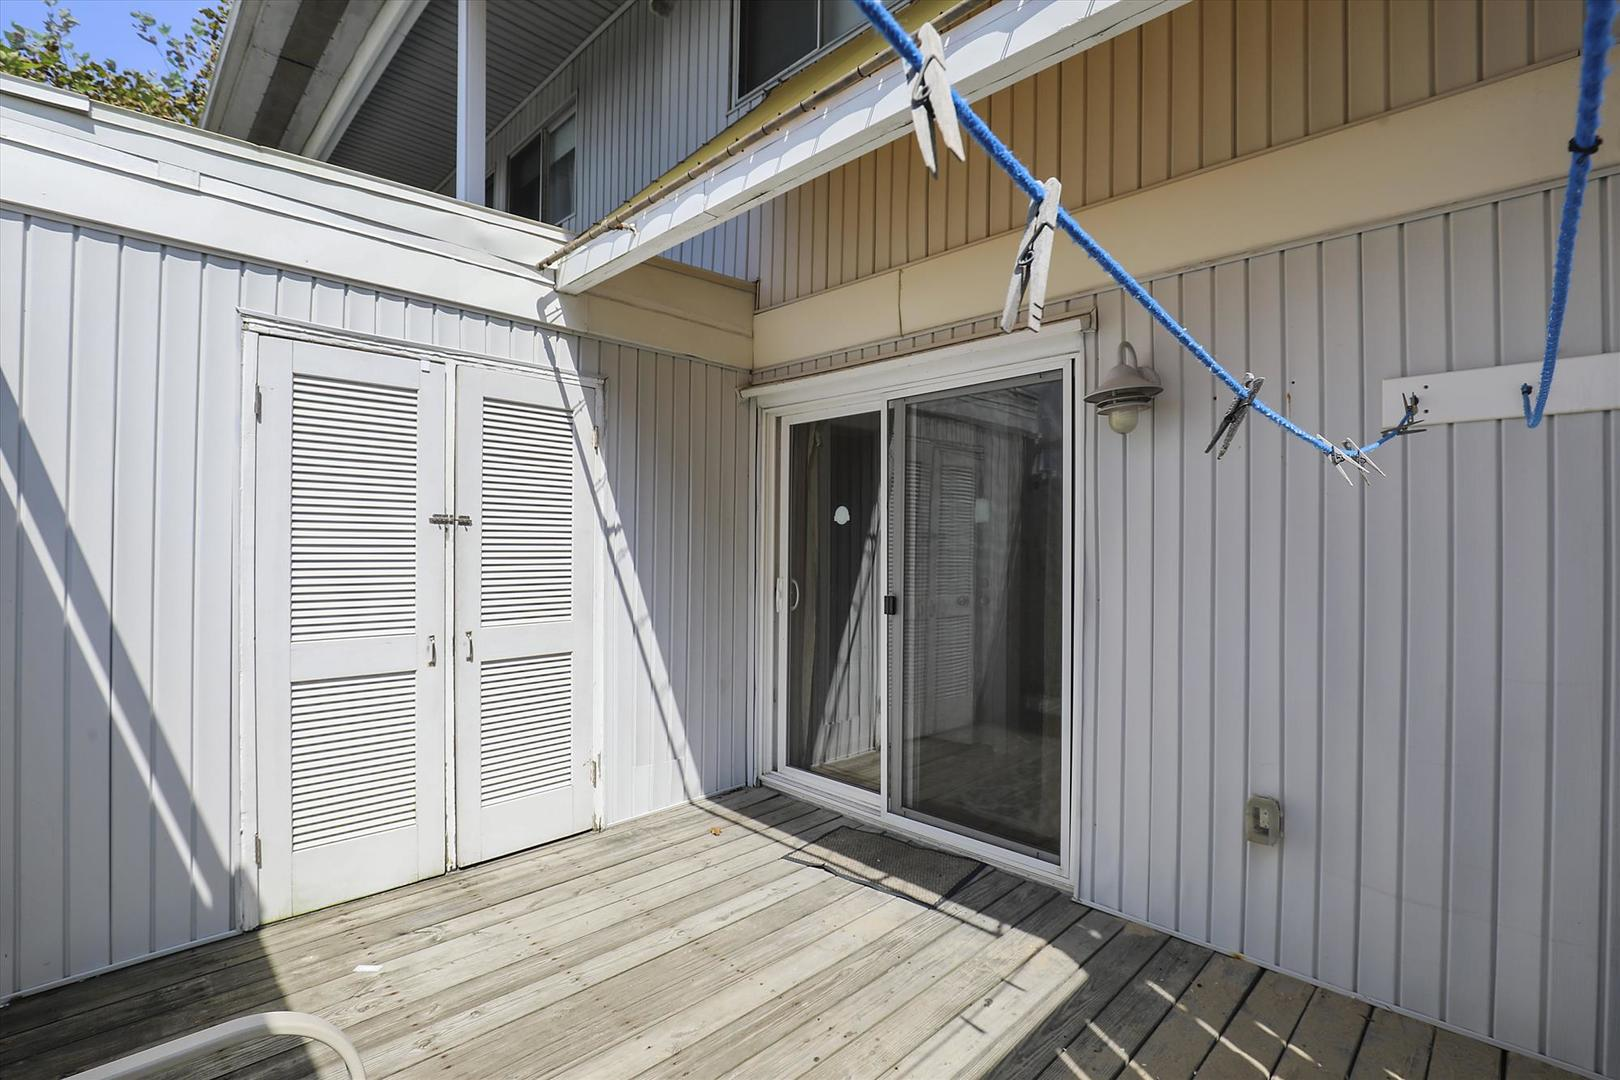 Beachwalk 23 - Deck Area and Outdoor Shower